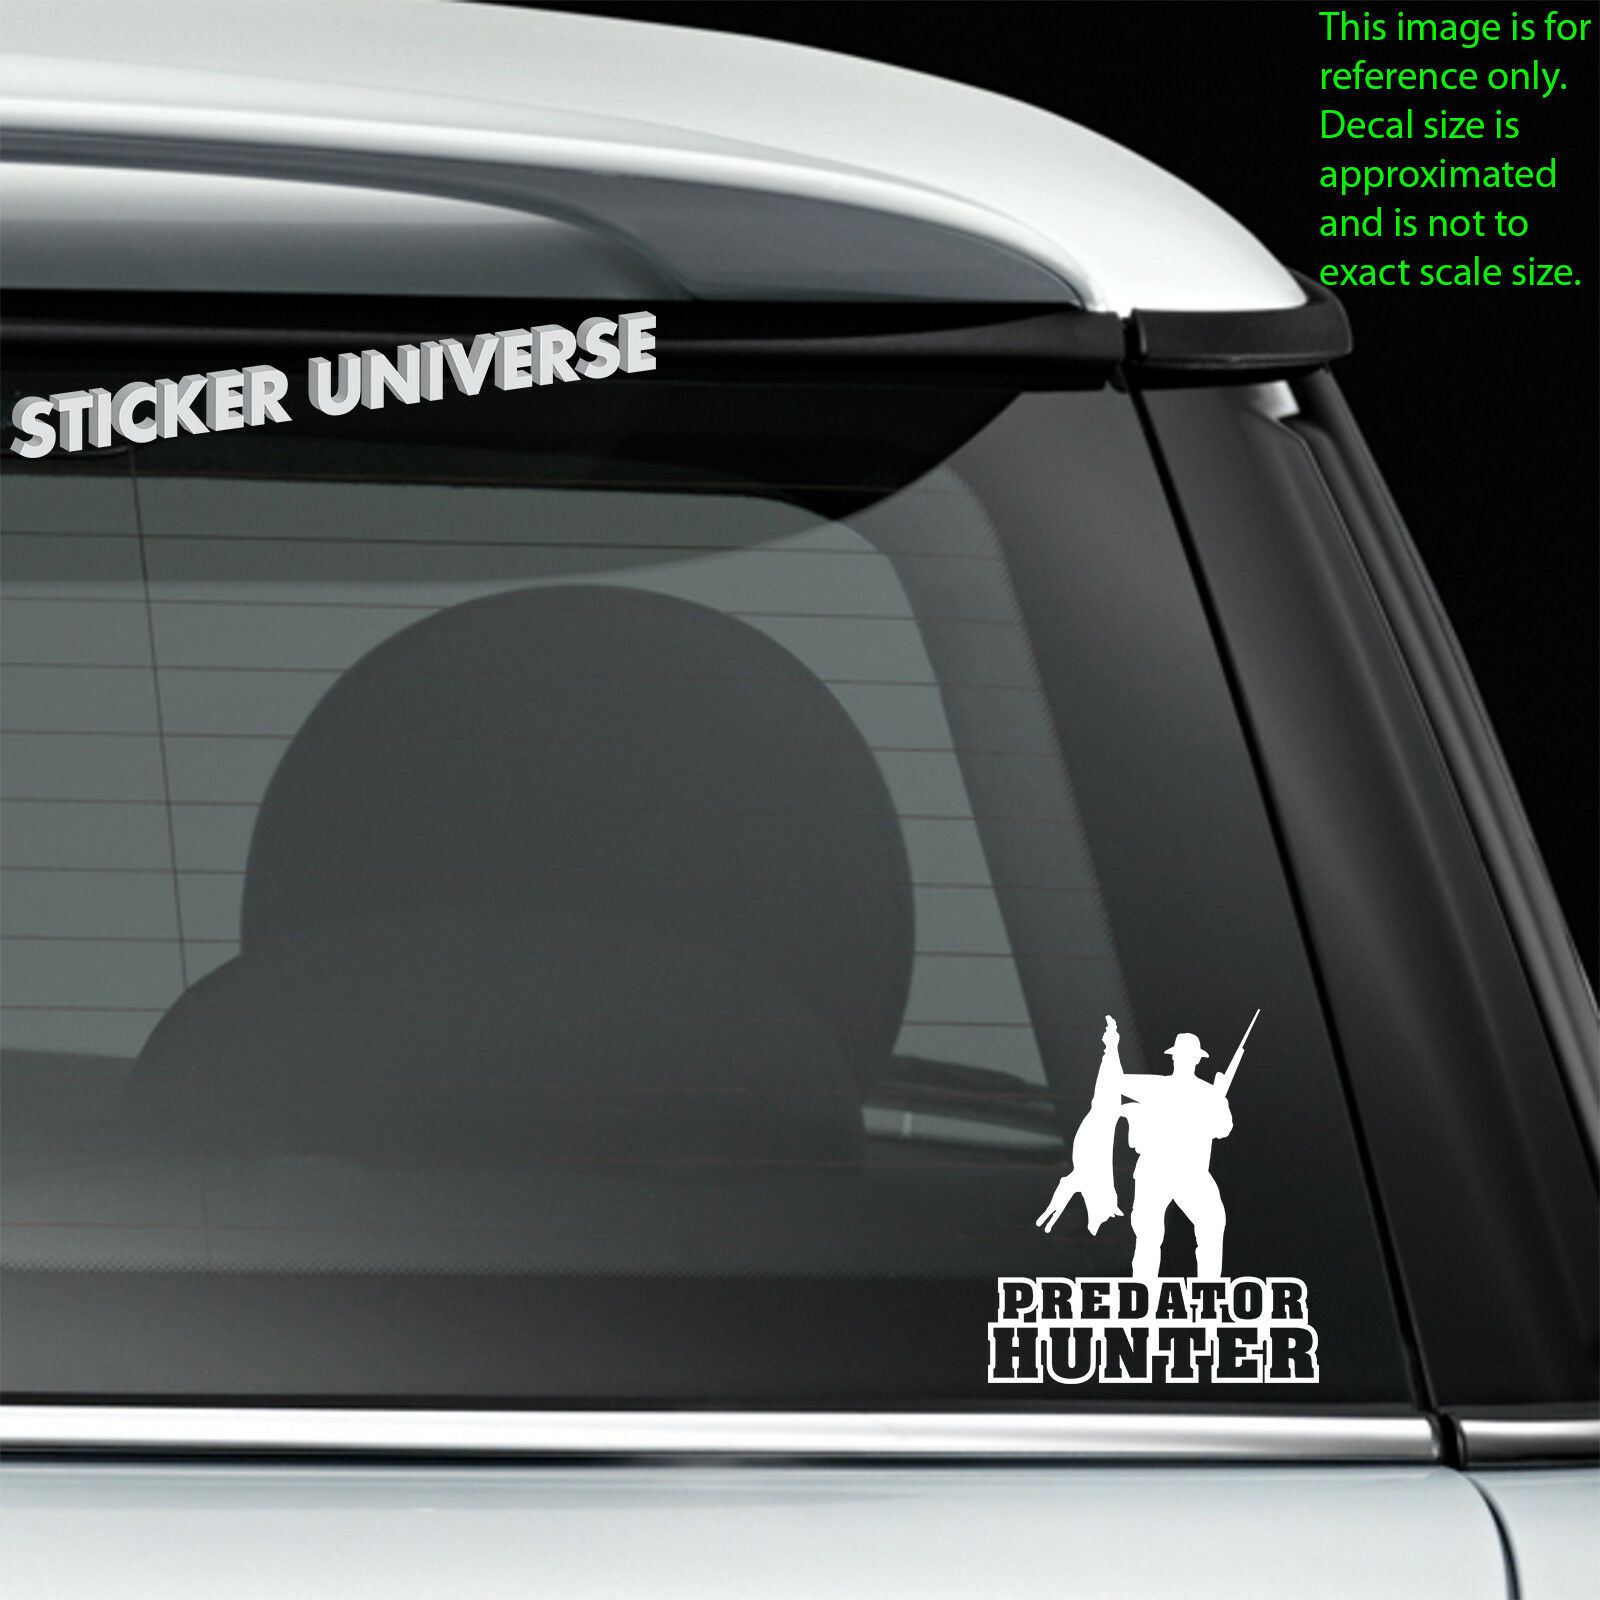 Predator Hunter Hunting Truck Car Window Decal Bumper Sticker Hunt Fox Bear 0206